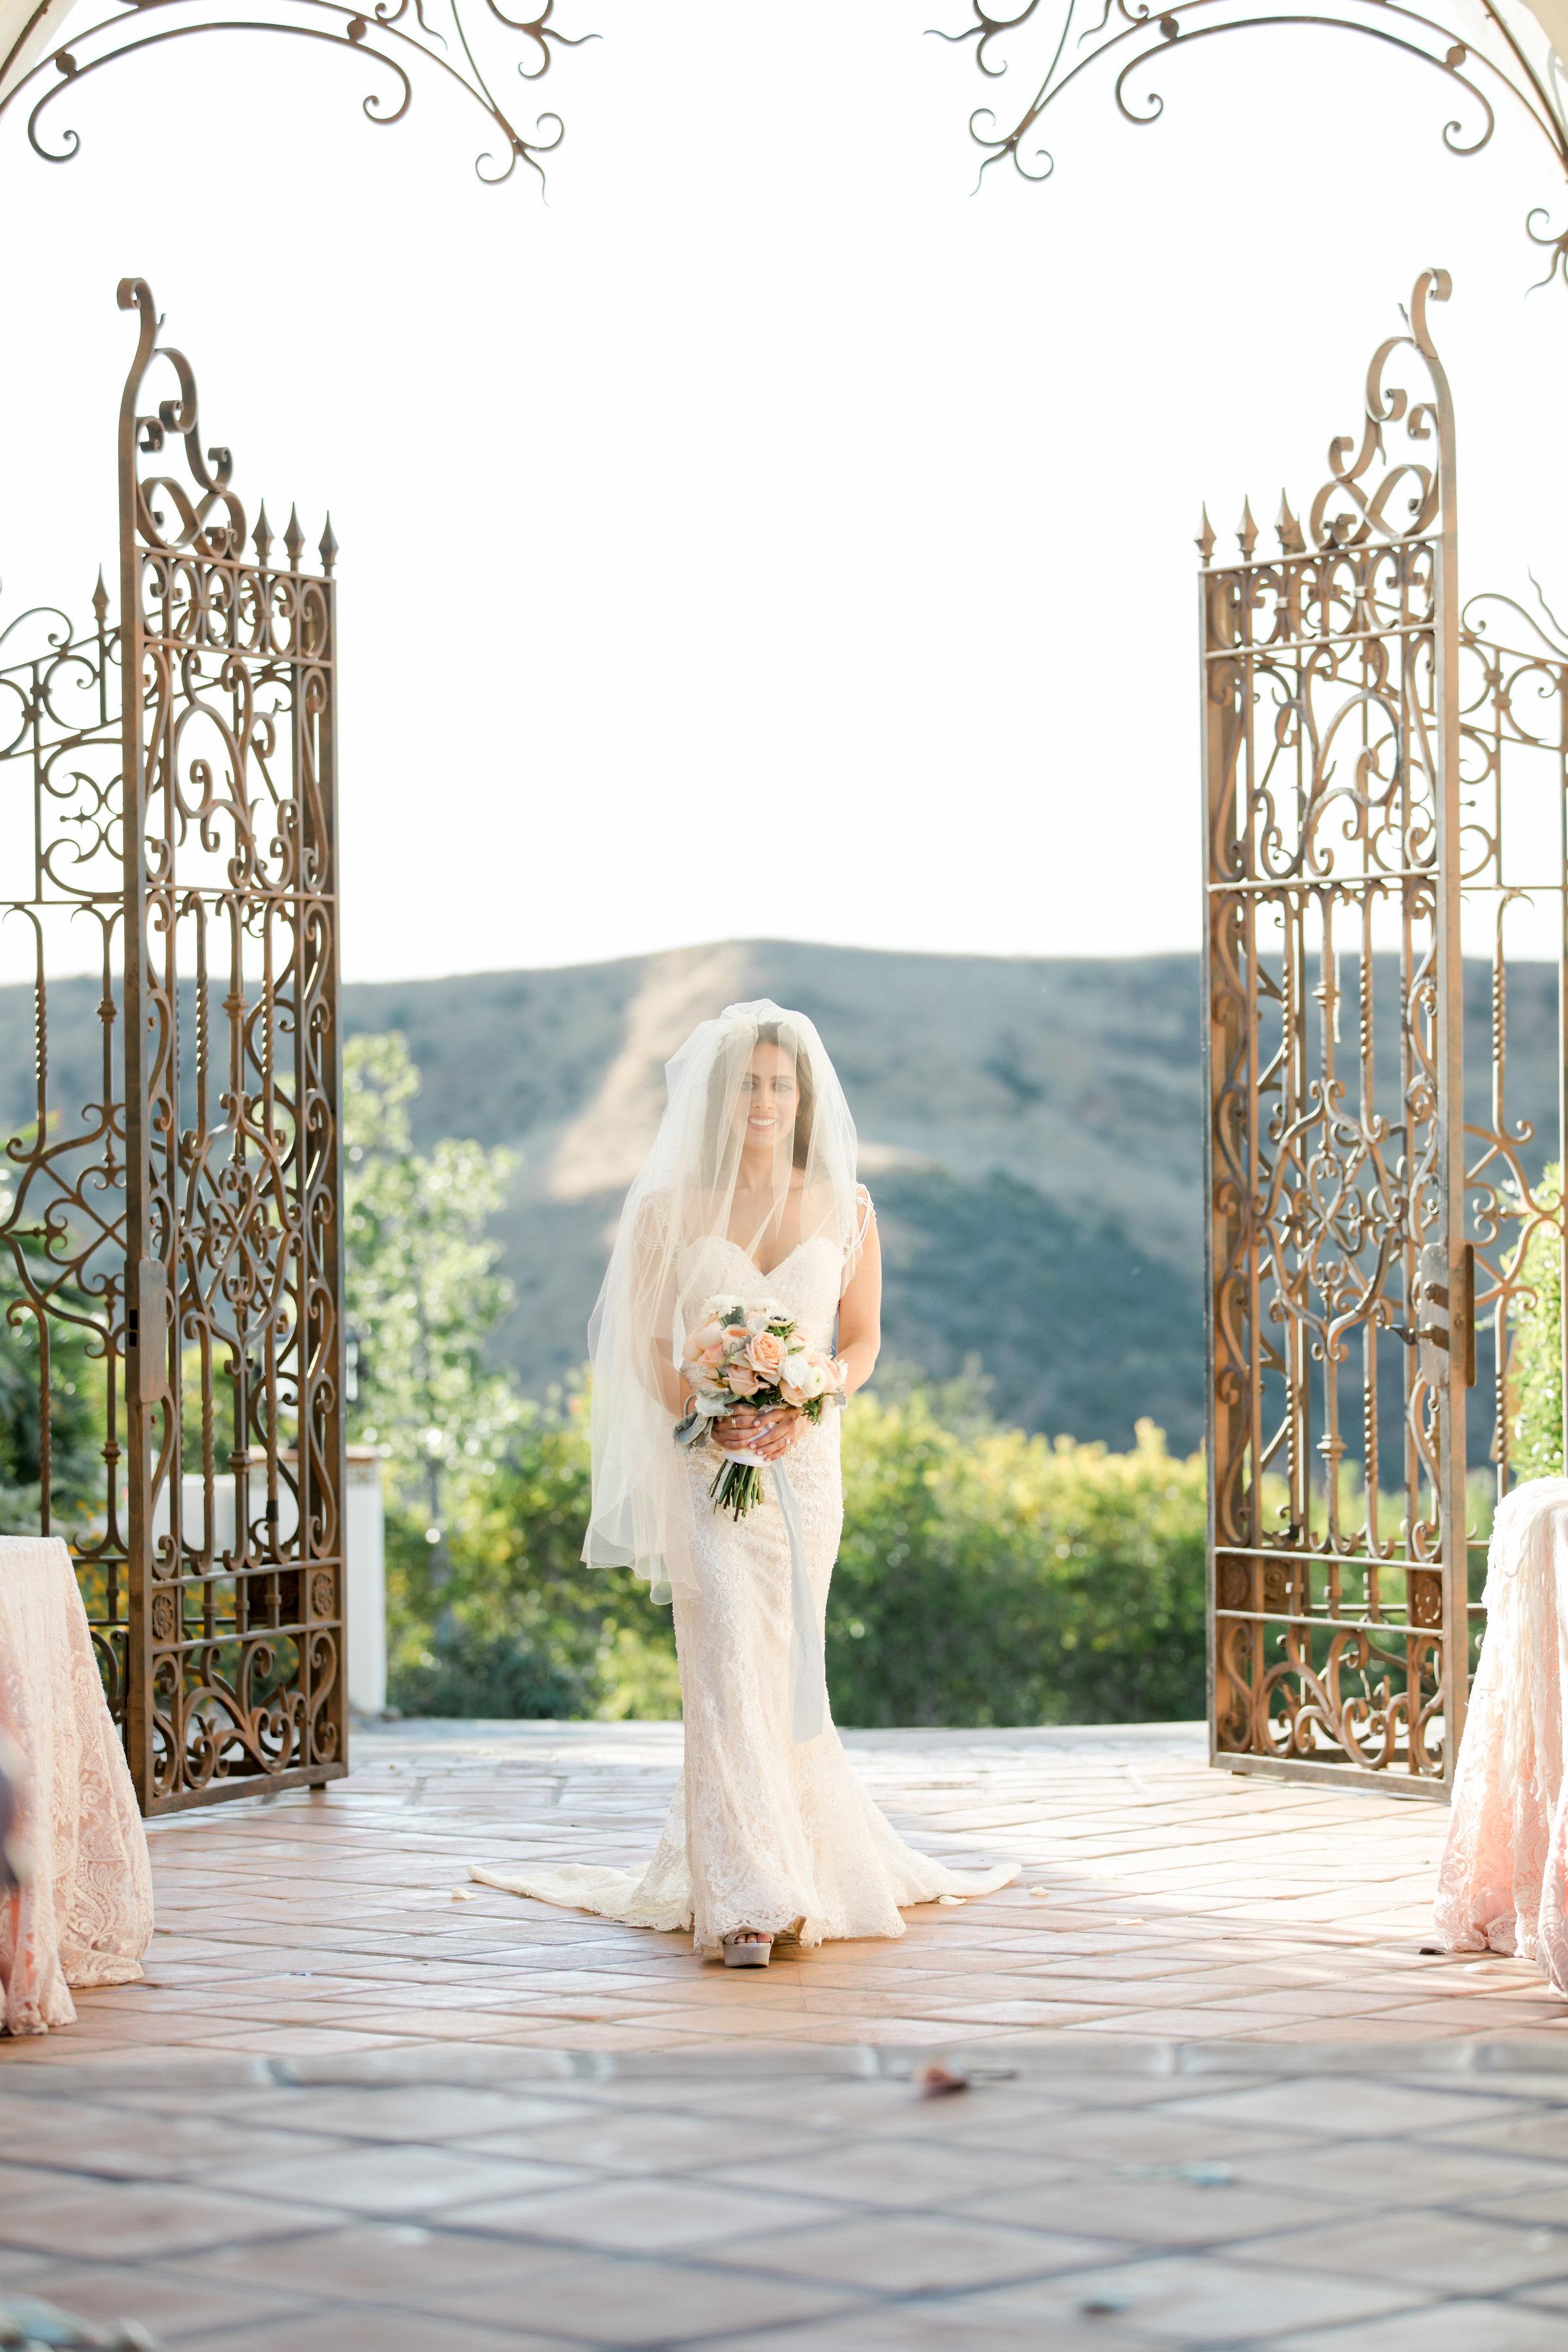 JennyQuicksallPhotography_www.jennyquicksall.com_HummingbirdNestRanchWedding_-456.jpg